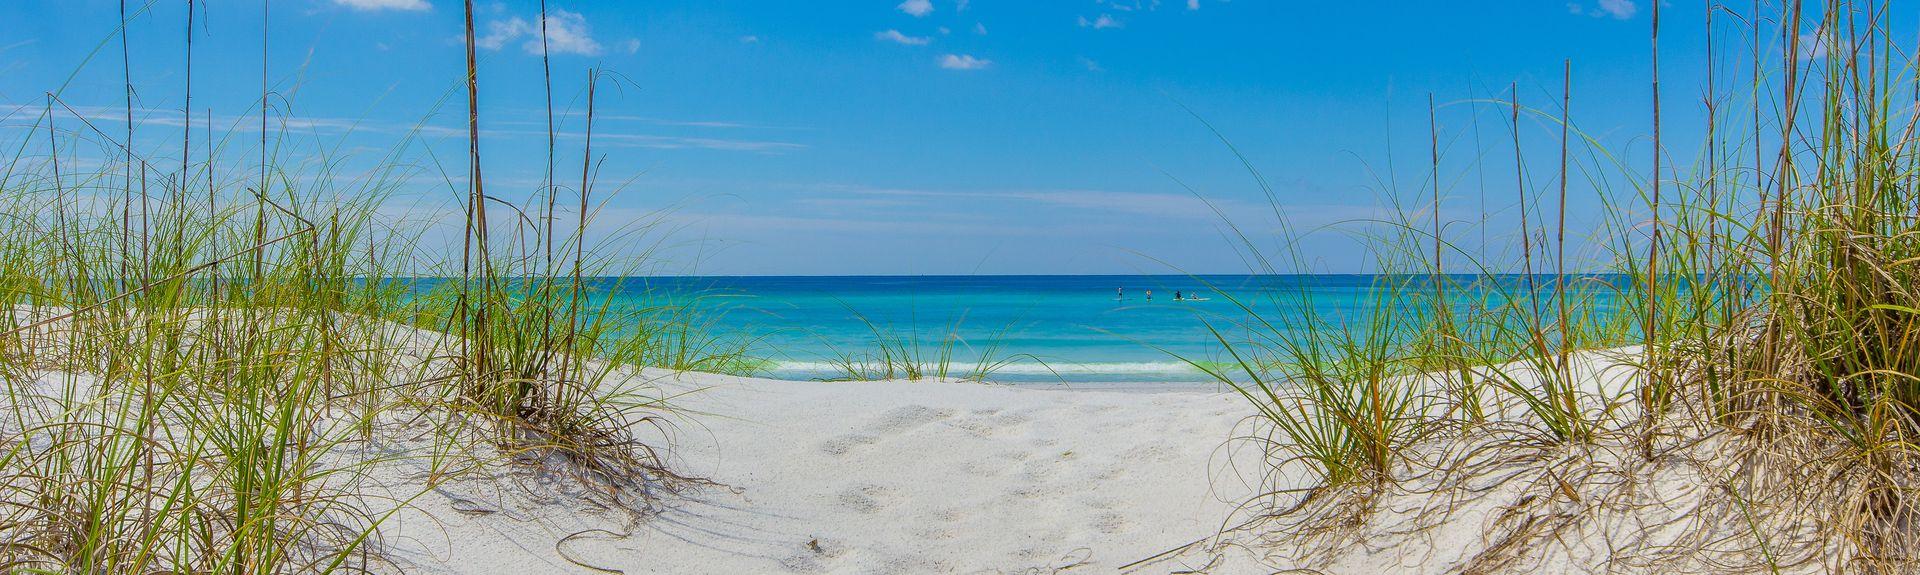 Caribbean Resort, Navarre Beach, Pensacola Beach, FL, USA